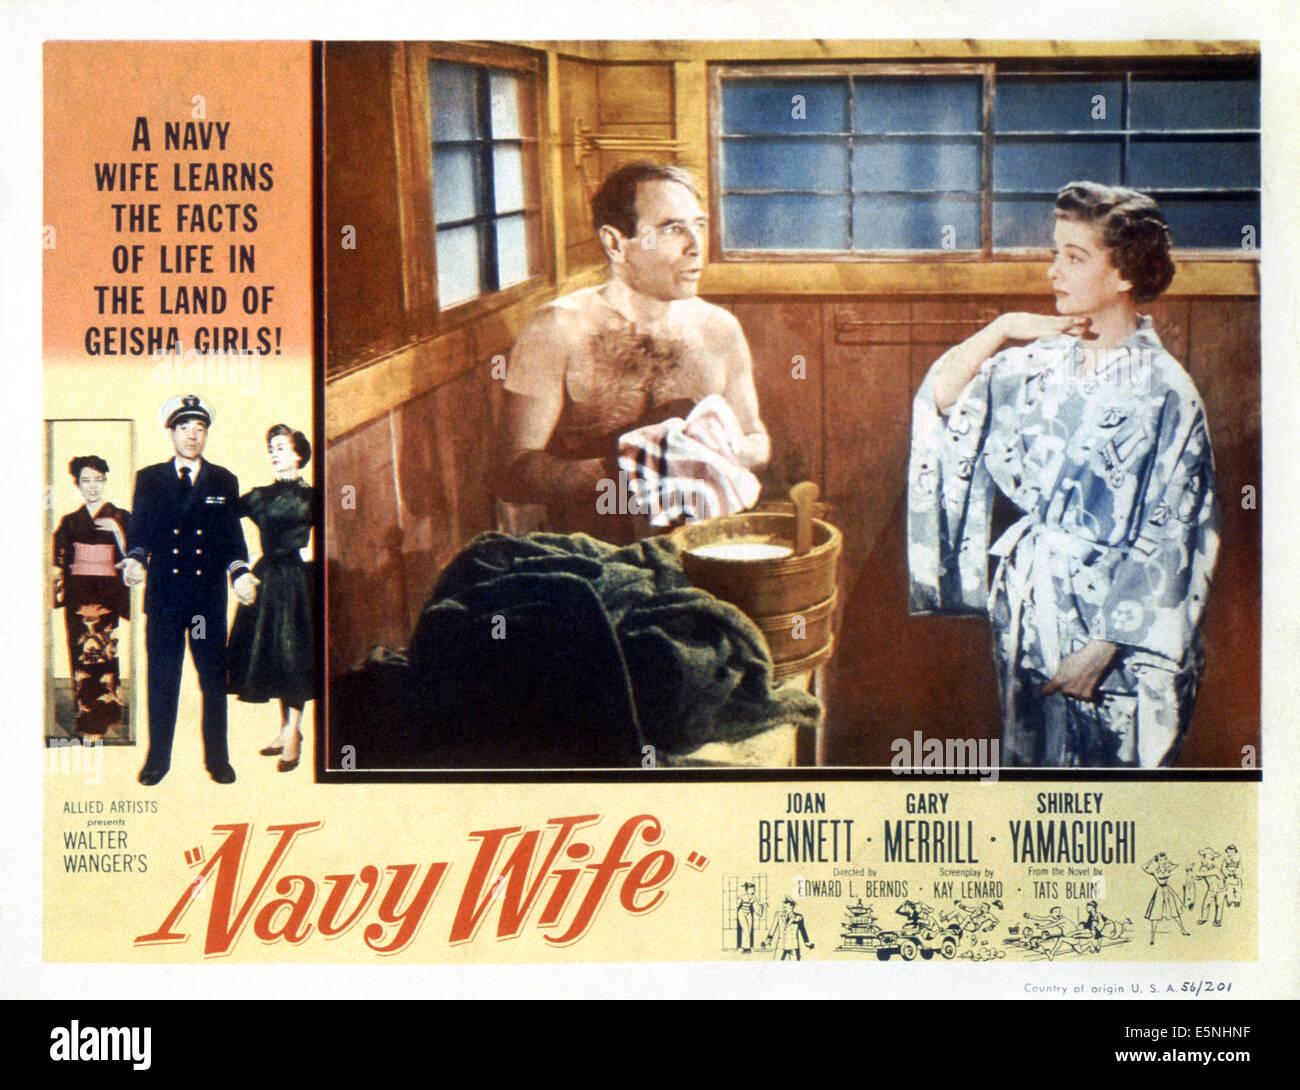 NAVY WIFE, from left: Shirley Yamaguchi, Gary Merrill, Joan Bennett,  1956 - Stock Image